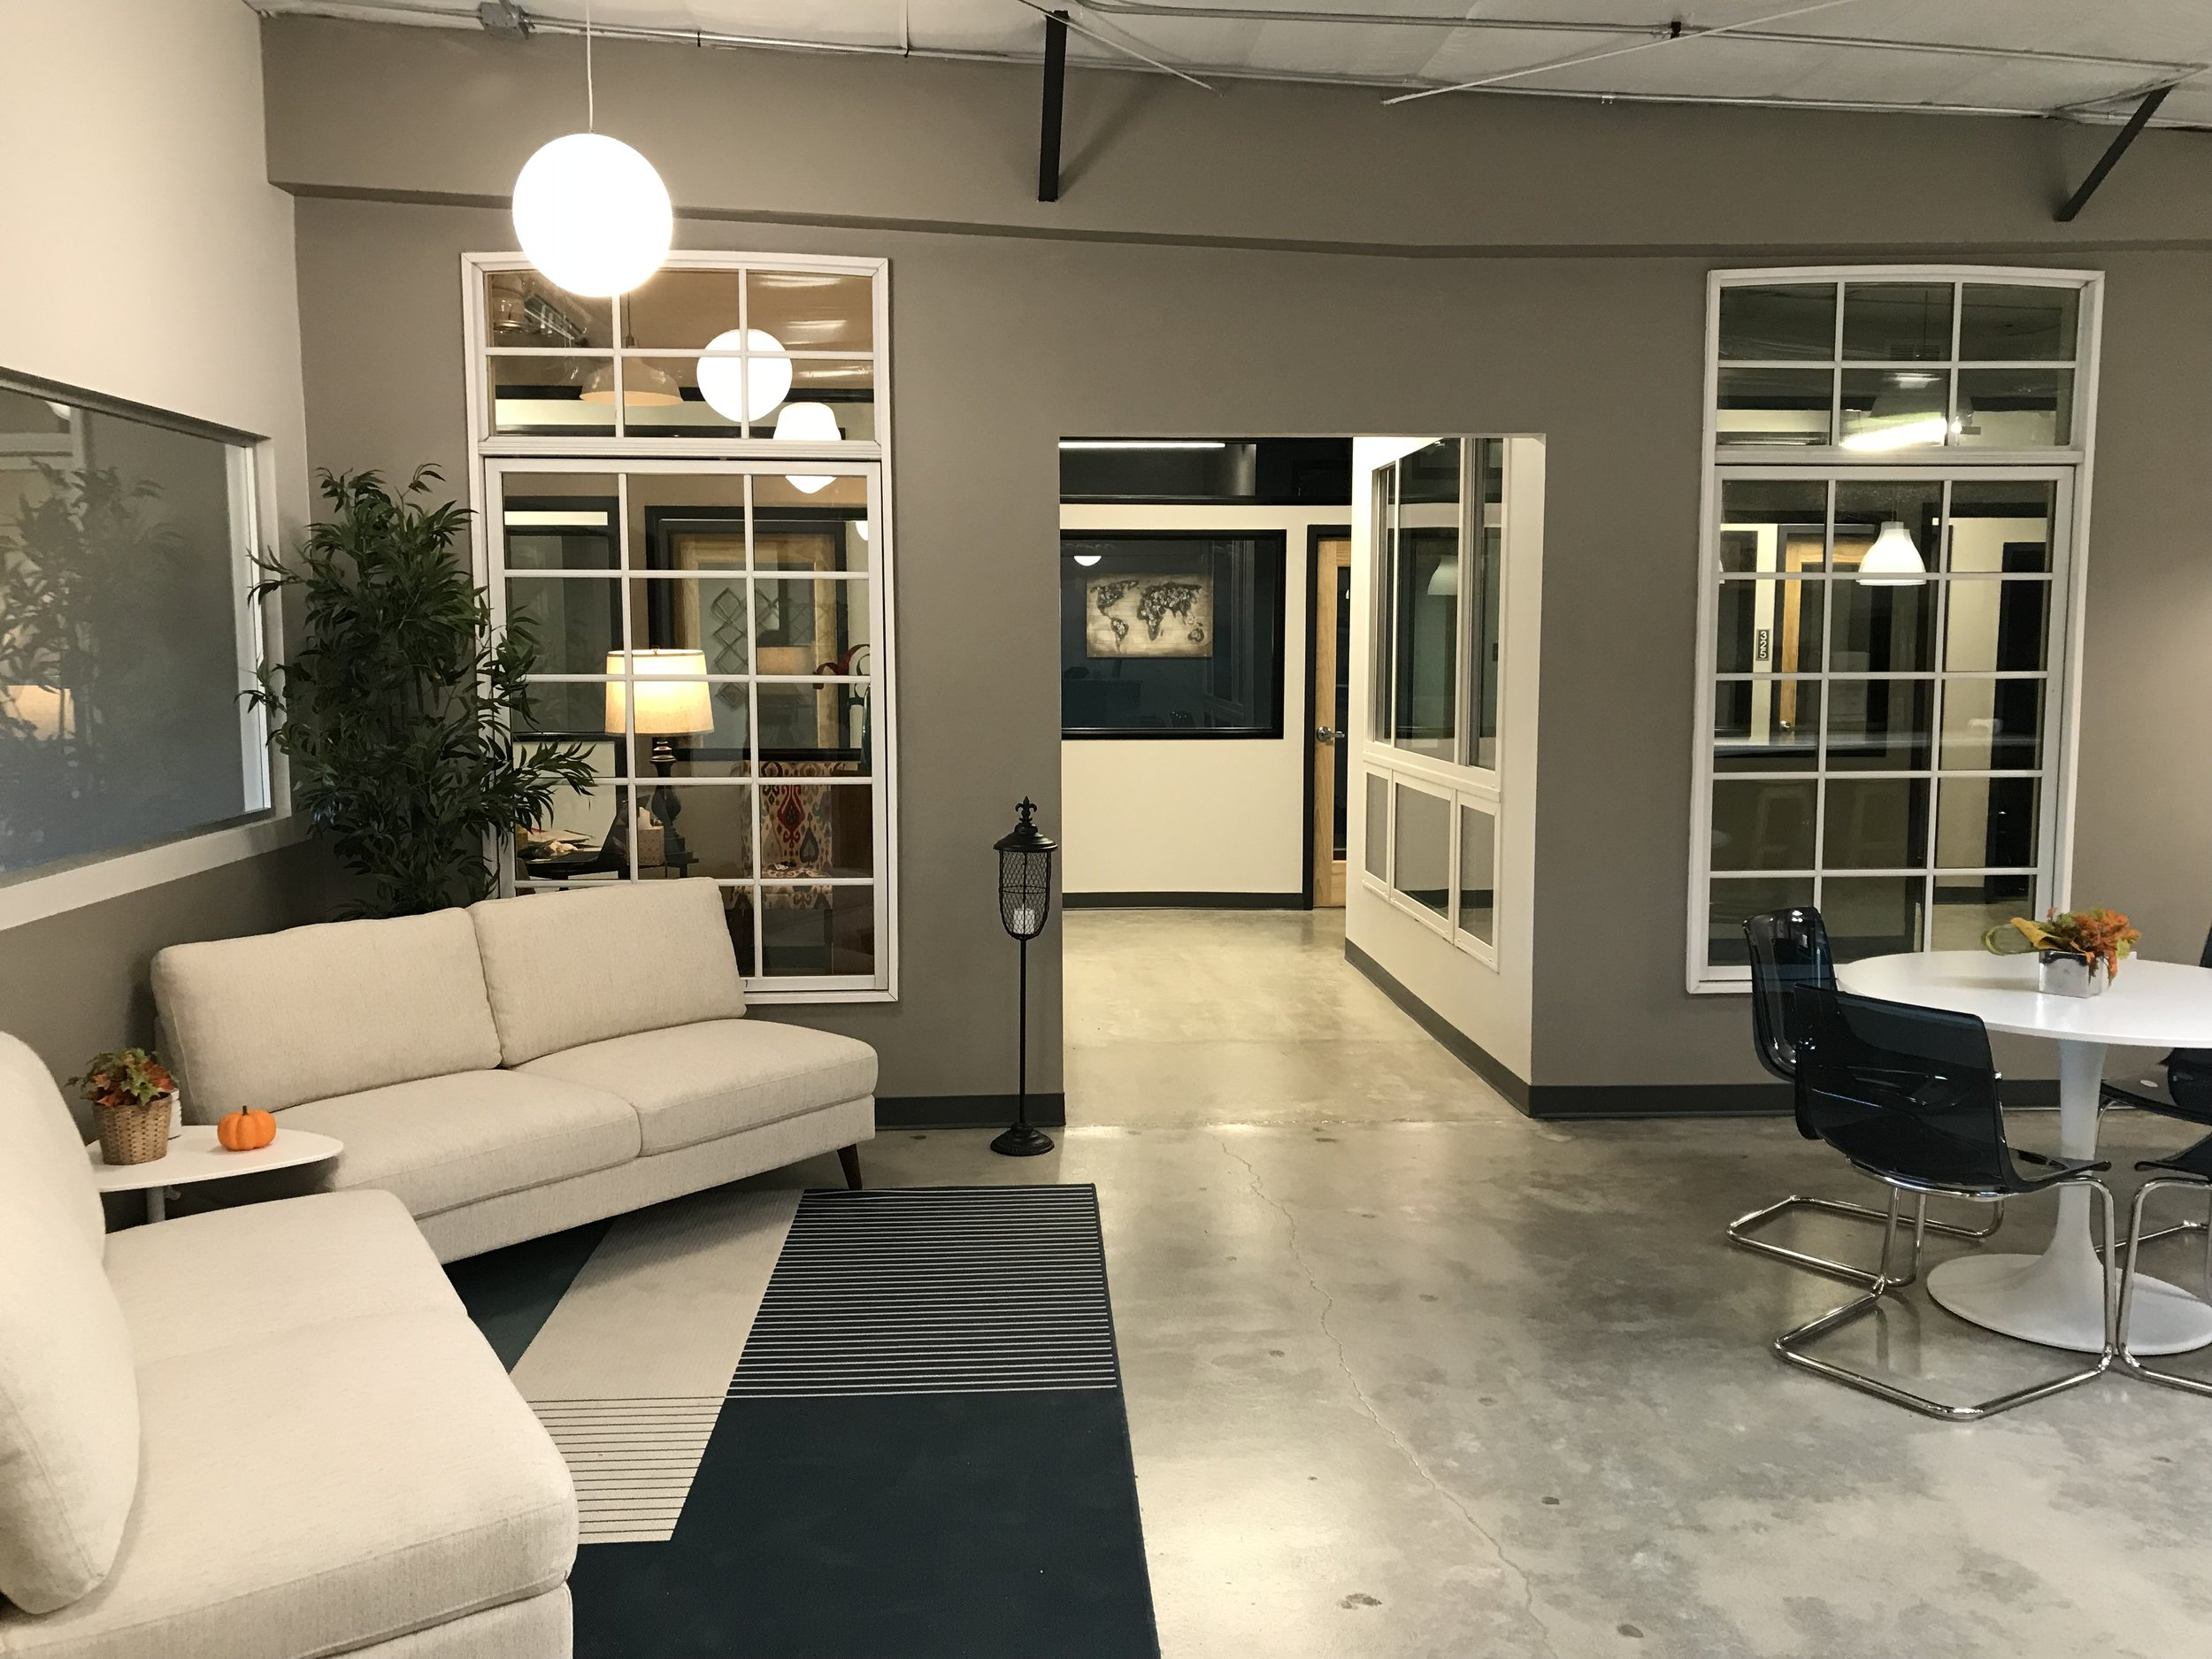 NEW 30 PRIVATE OFFICE COLLORABITIVE WORK SPACE